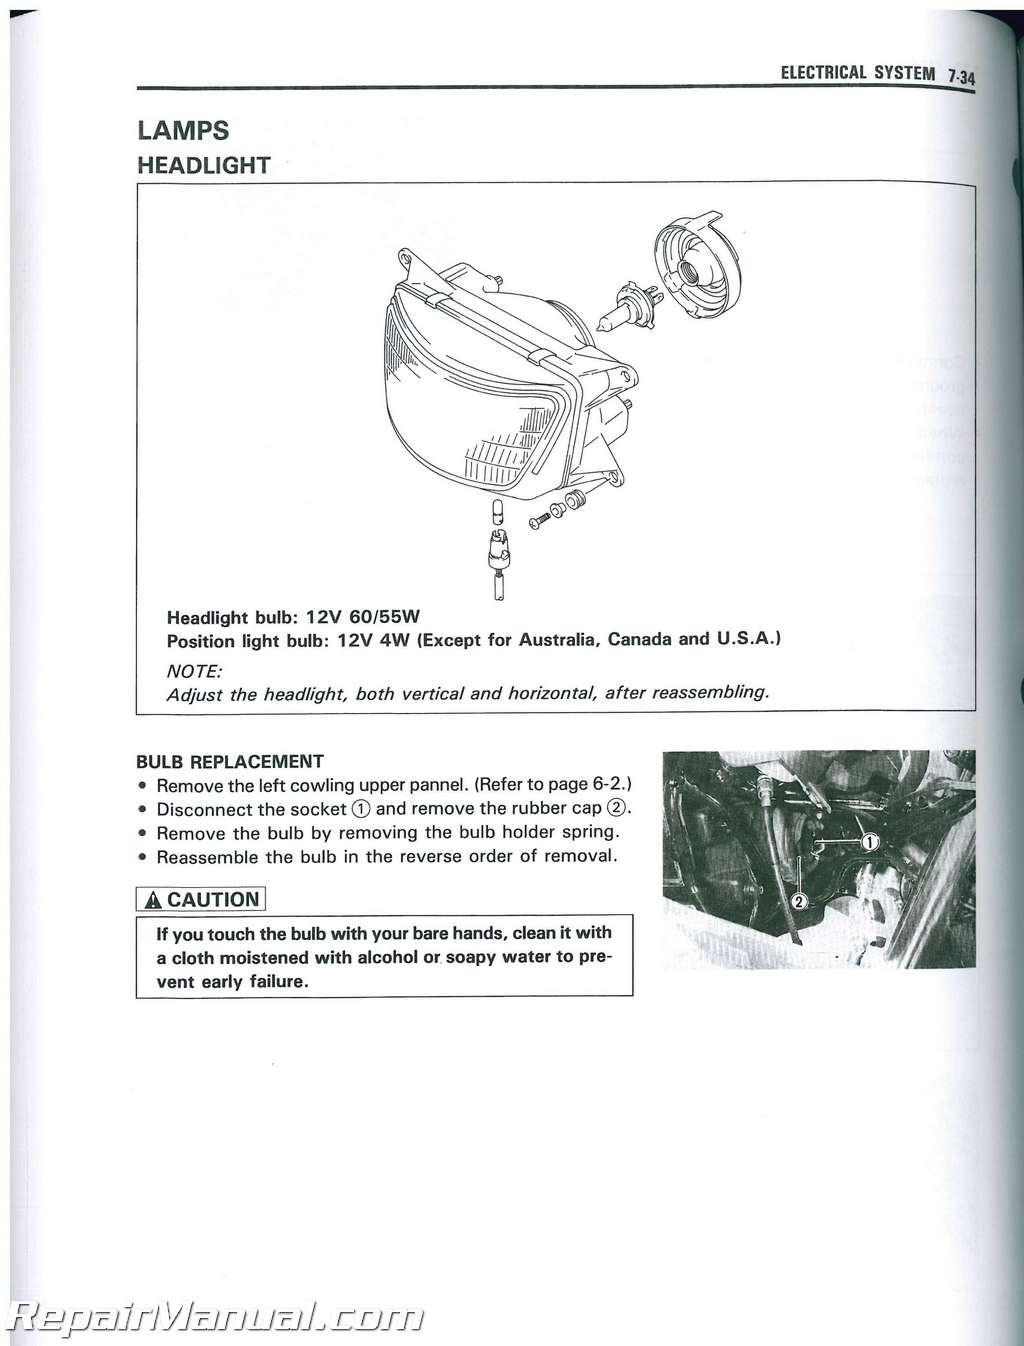 ... 1994-1997-Suzuki-RF900R-Service-Manual_006.jpg